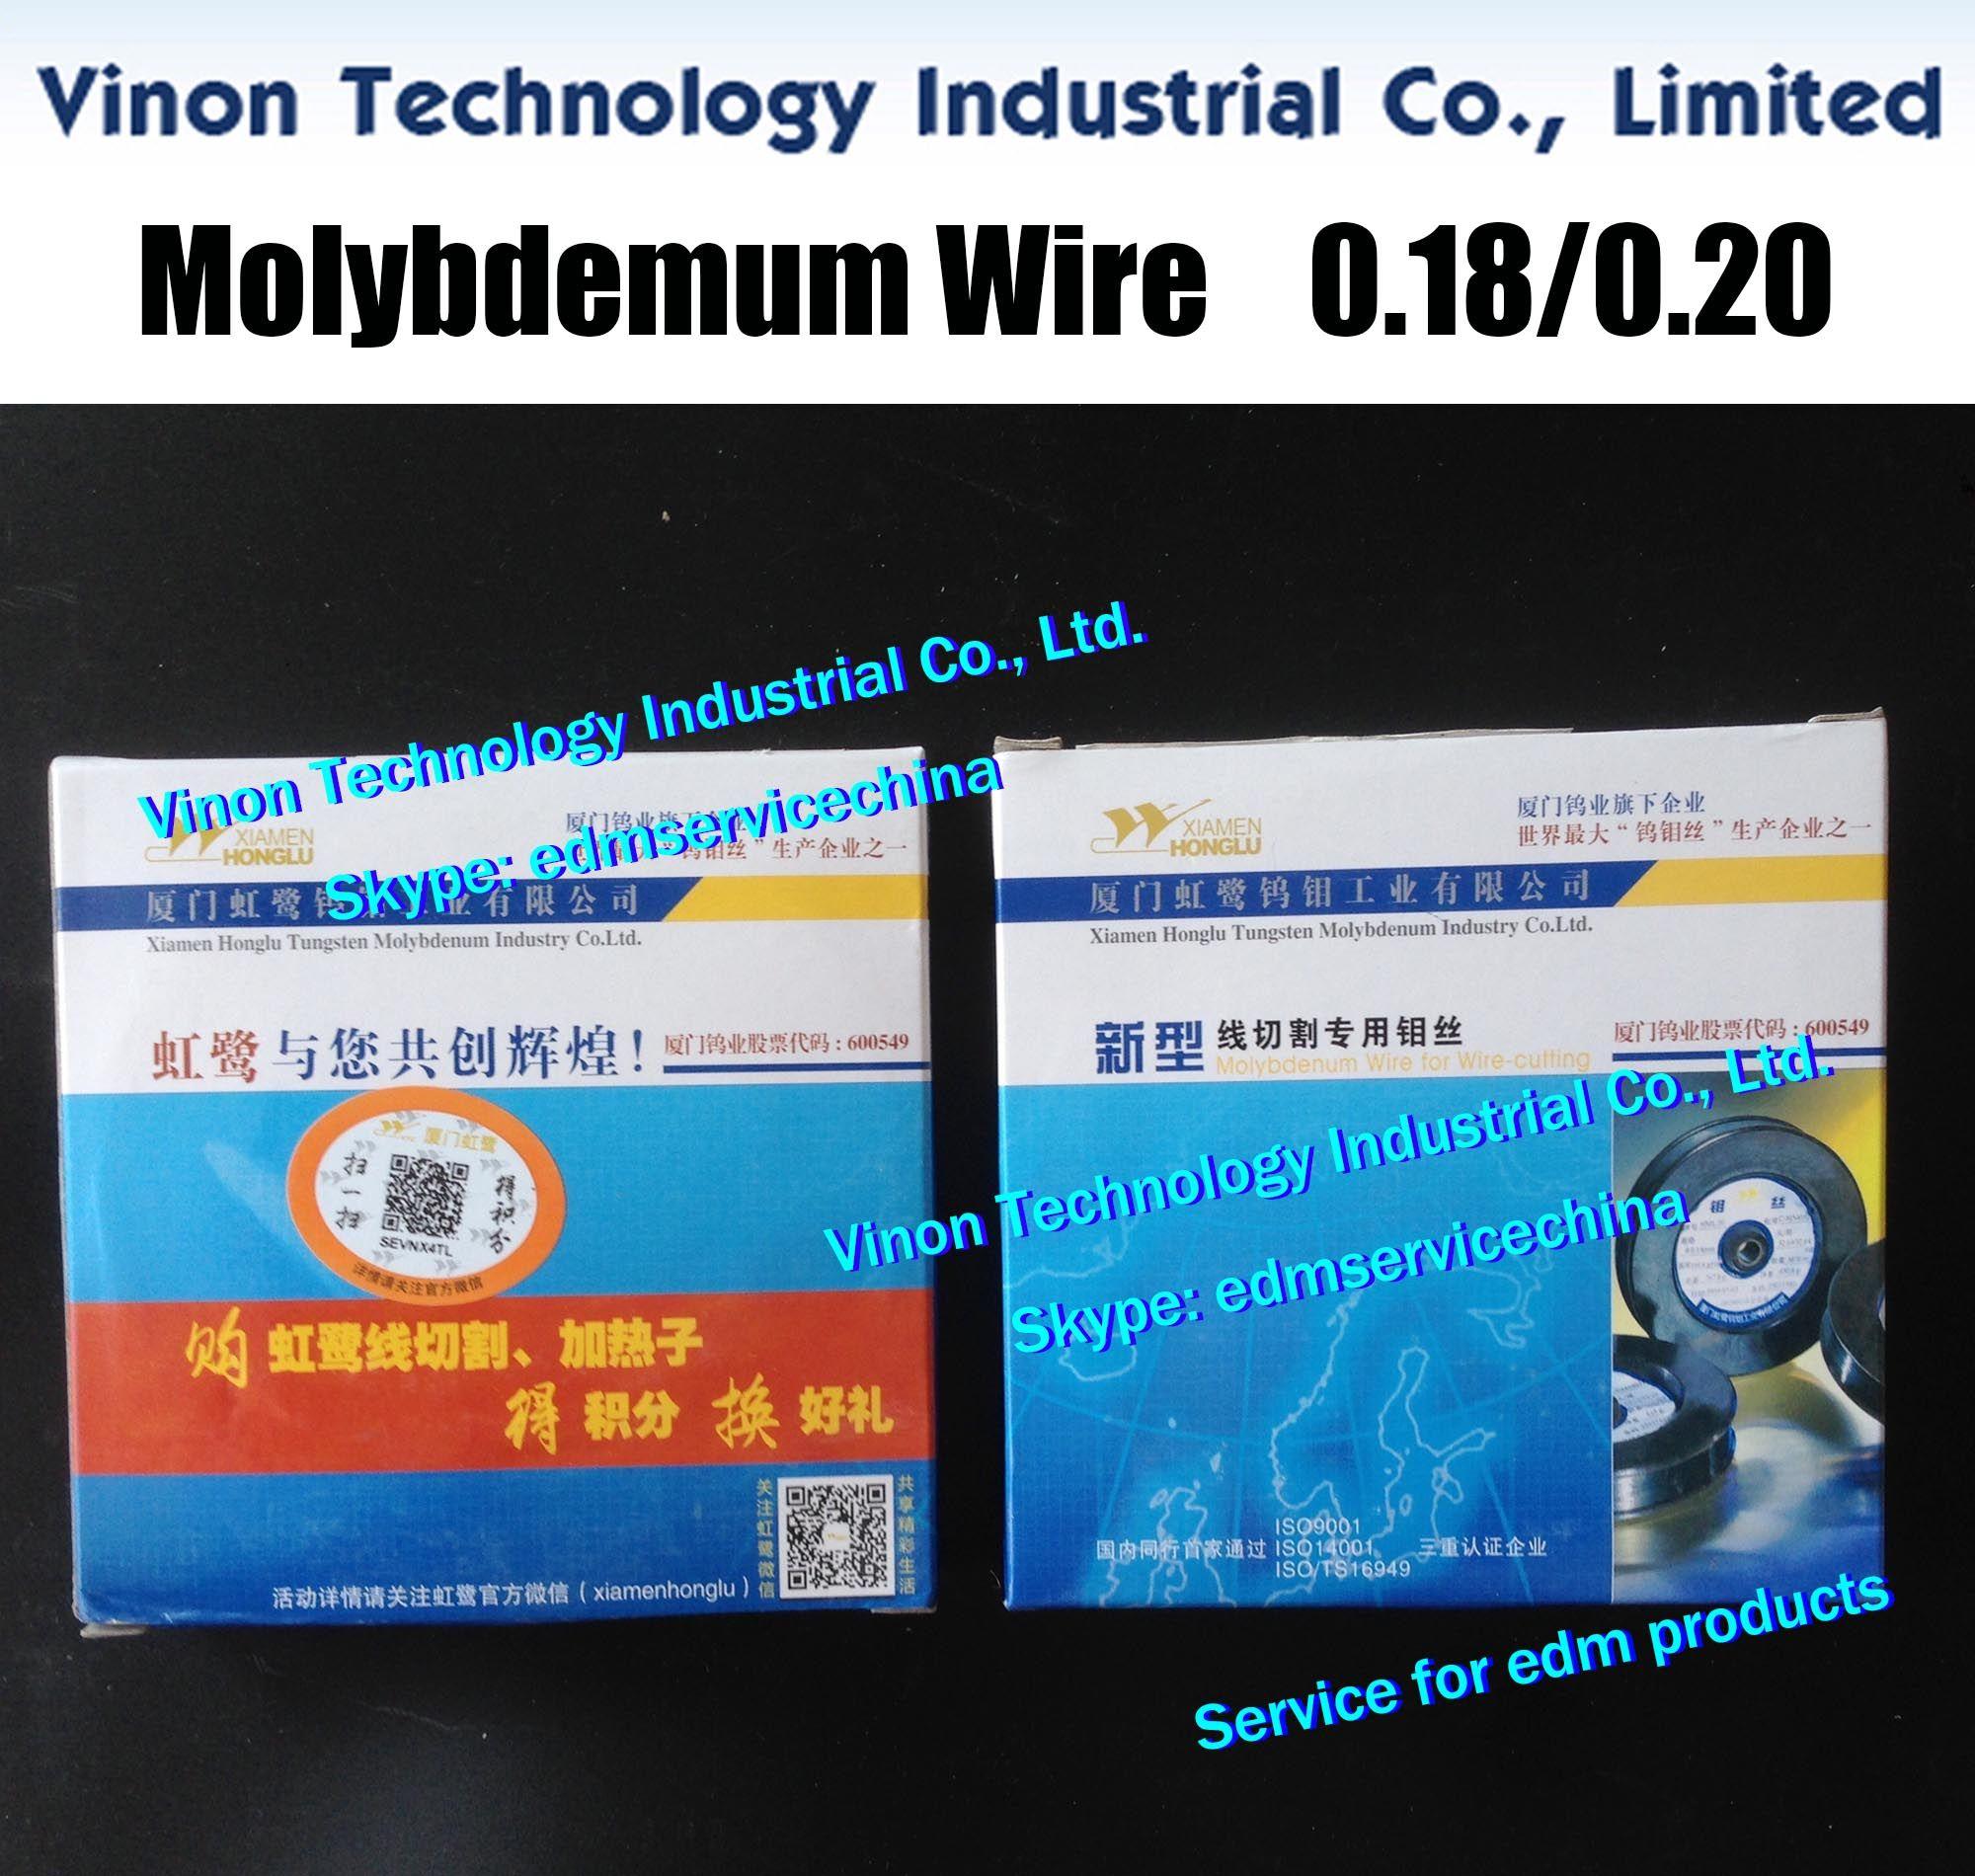 (5 Spulen) 0.18mm * 2000meters EDM Molybdändraht (Honglu Marke), HS-WEDM Molybdändraht für 0.18mm Drahtabschneide (5 Spools = 10,000Mtrs)